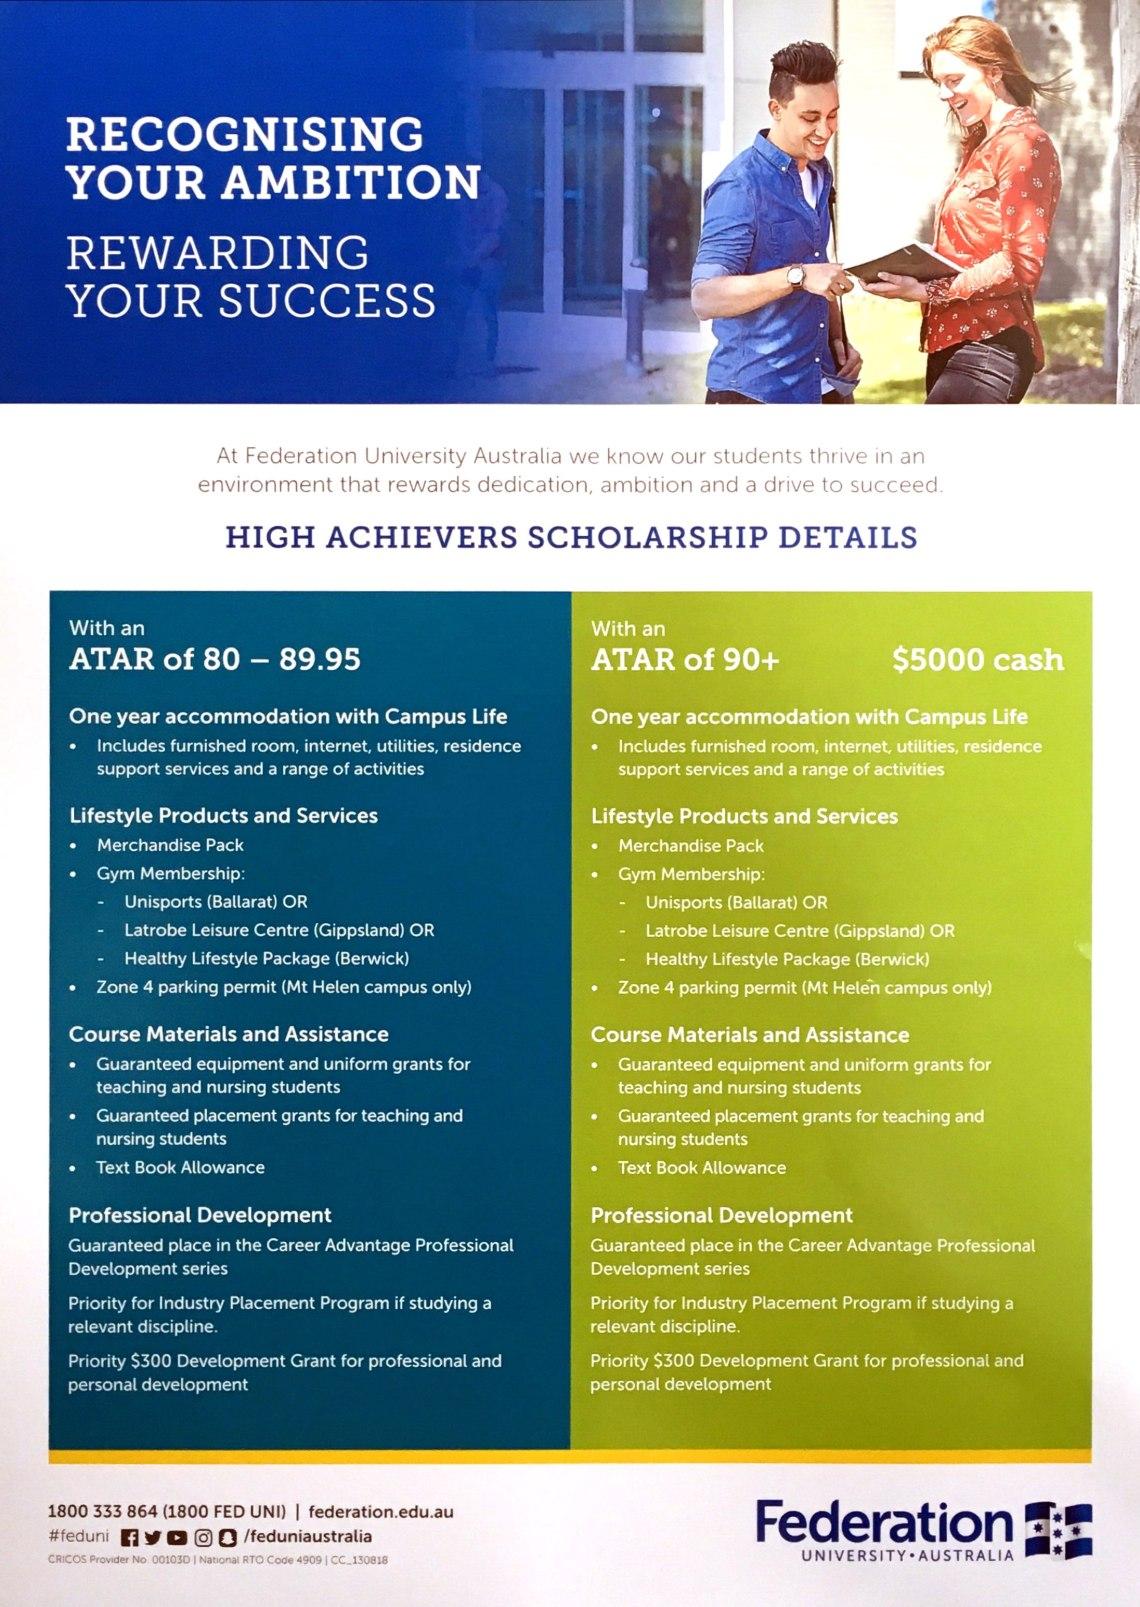 FedUni High Achievers Scholarship.jpg